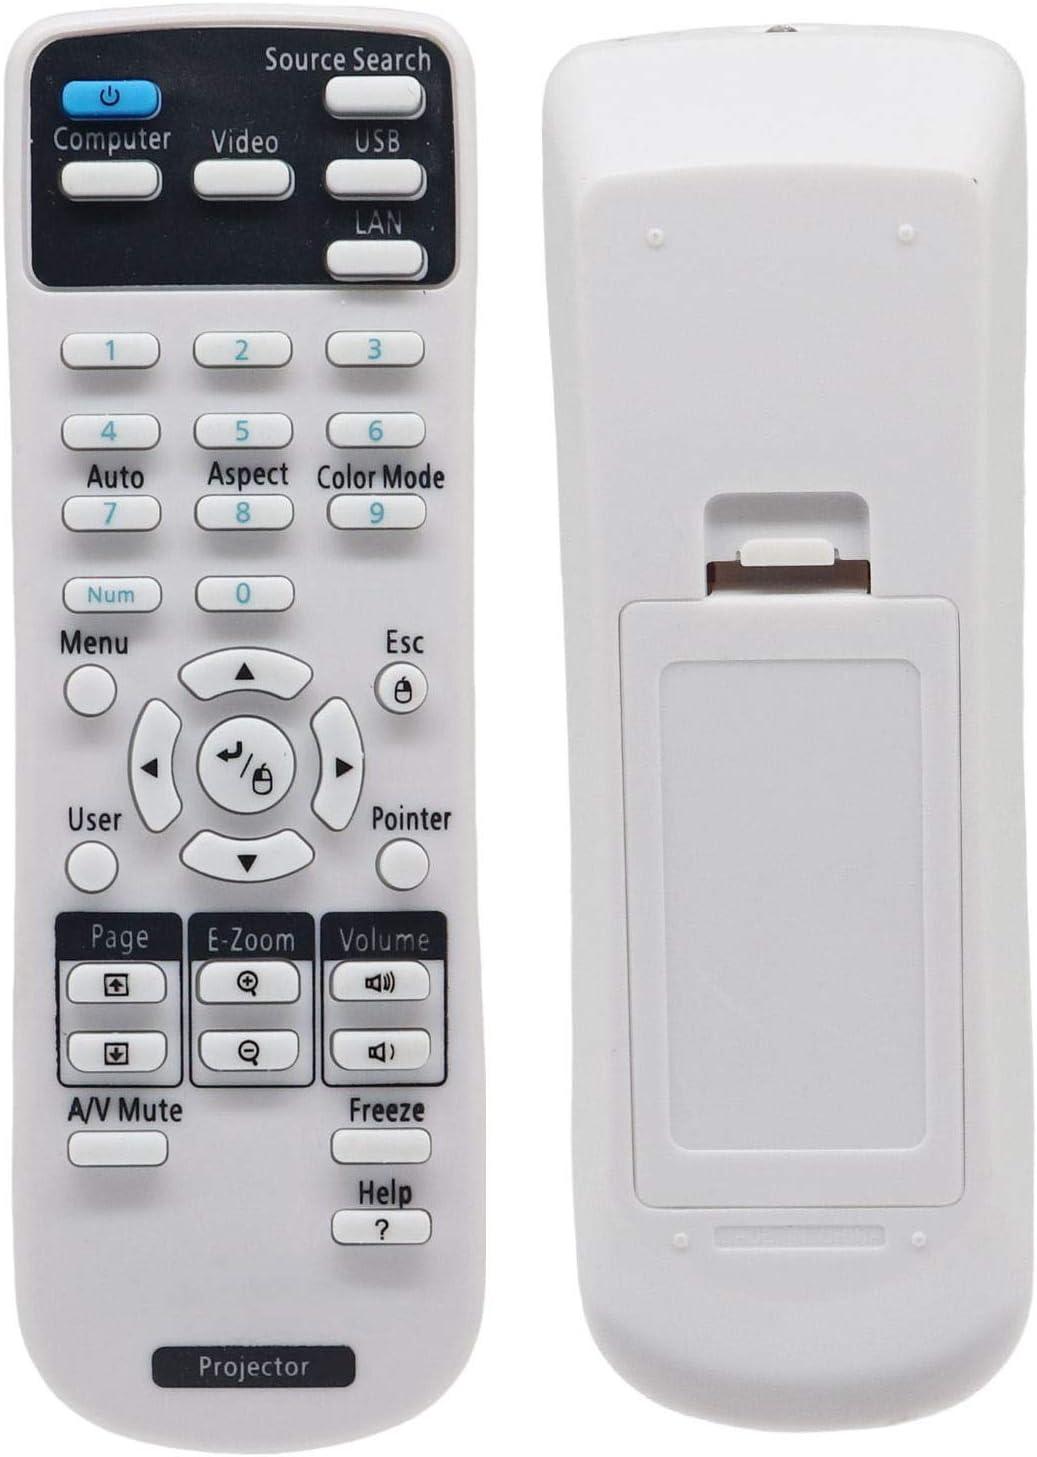 2181788 Universal Projector Remote Control for Epson Projectors BrightLink 575Wi 585Wi 595Wi435Wi 475Wi 480i 485Wi PowerLite 1224 1264 1284 1286Home Cinema 705HD 710HD 725HD 730HD W04 W32 Controller